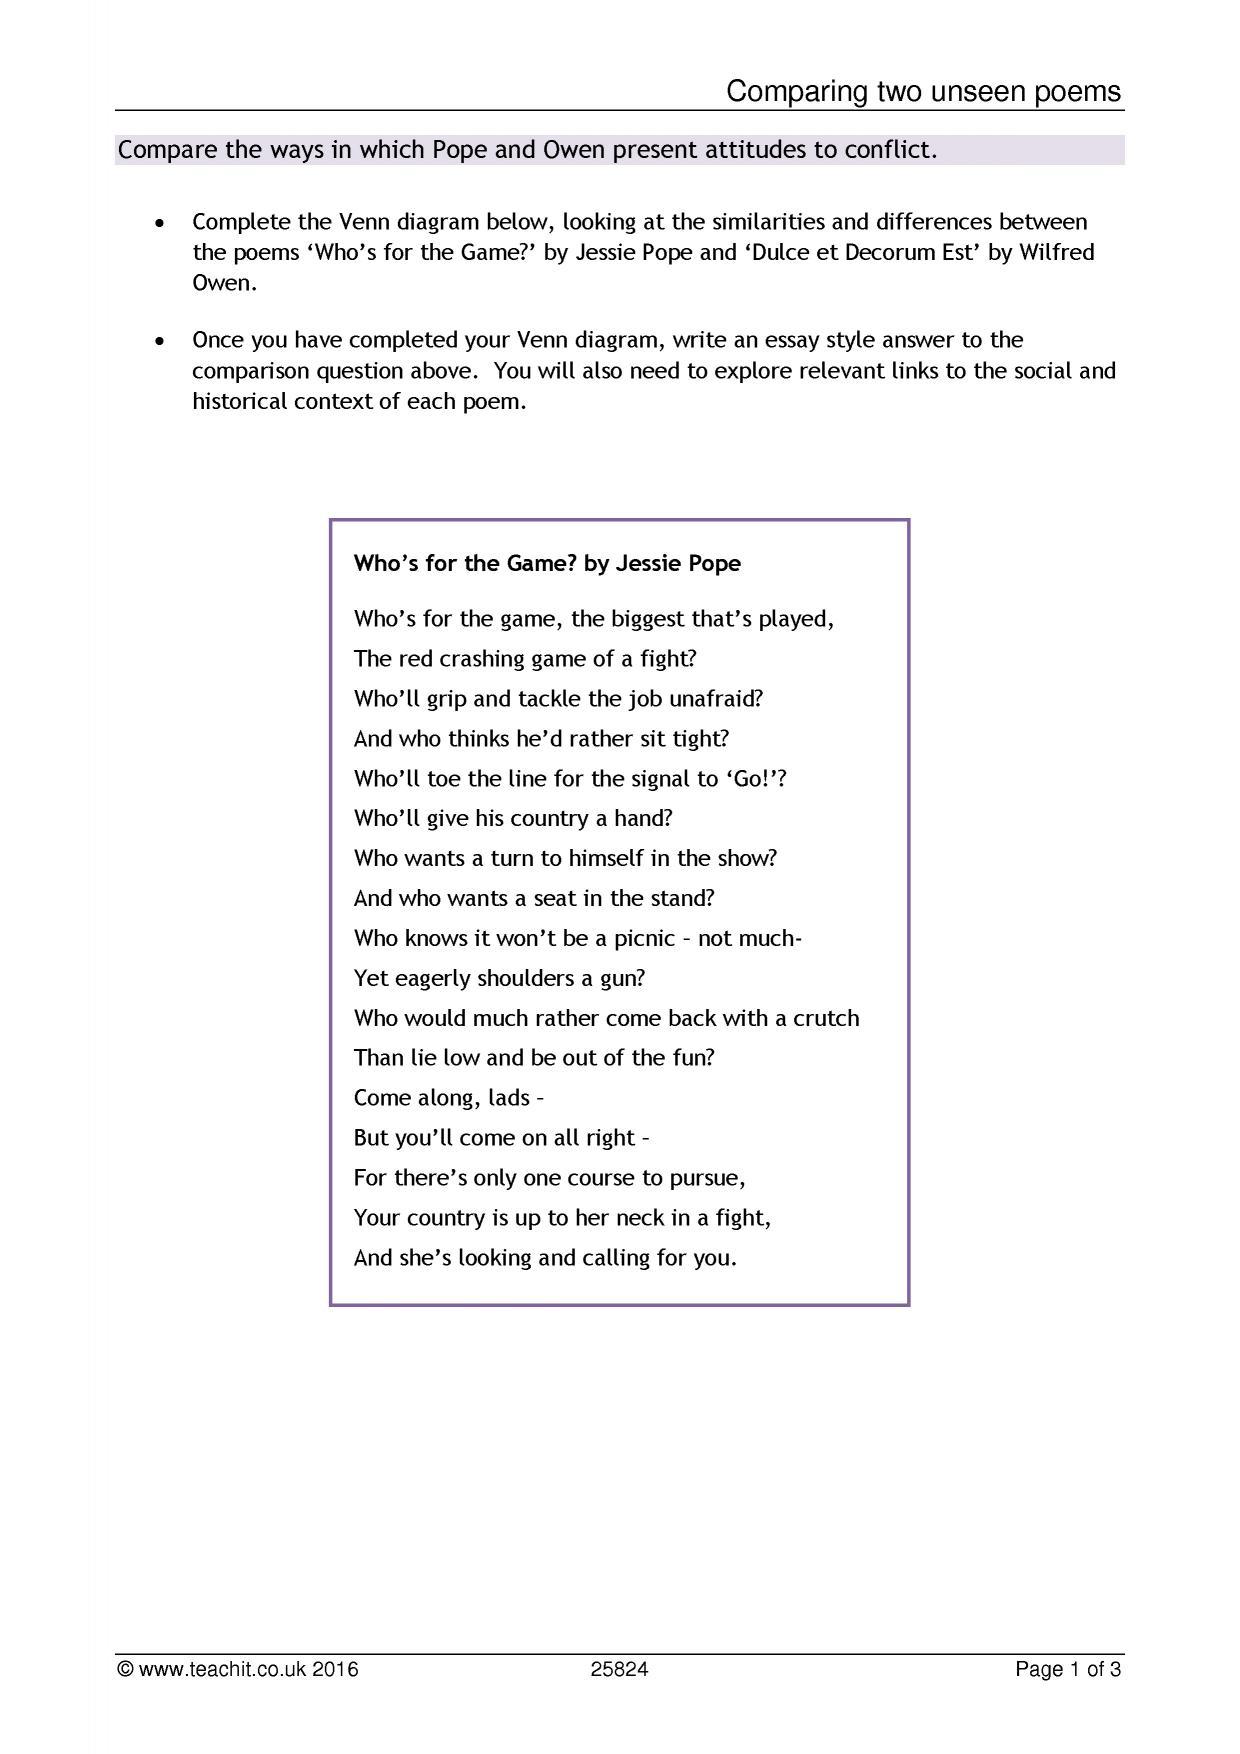 a comparison of john clare poems essay